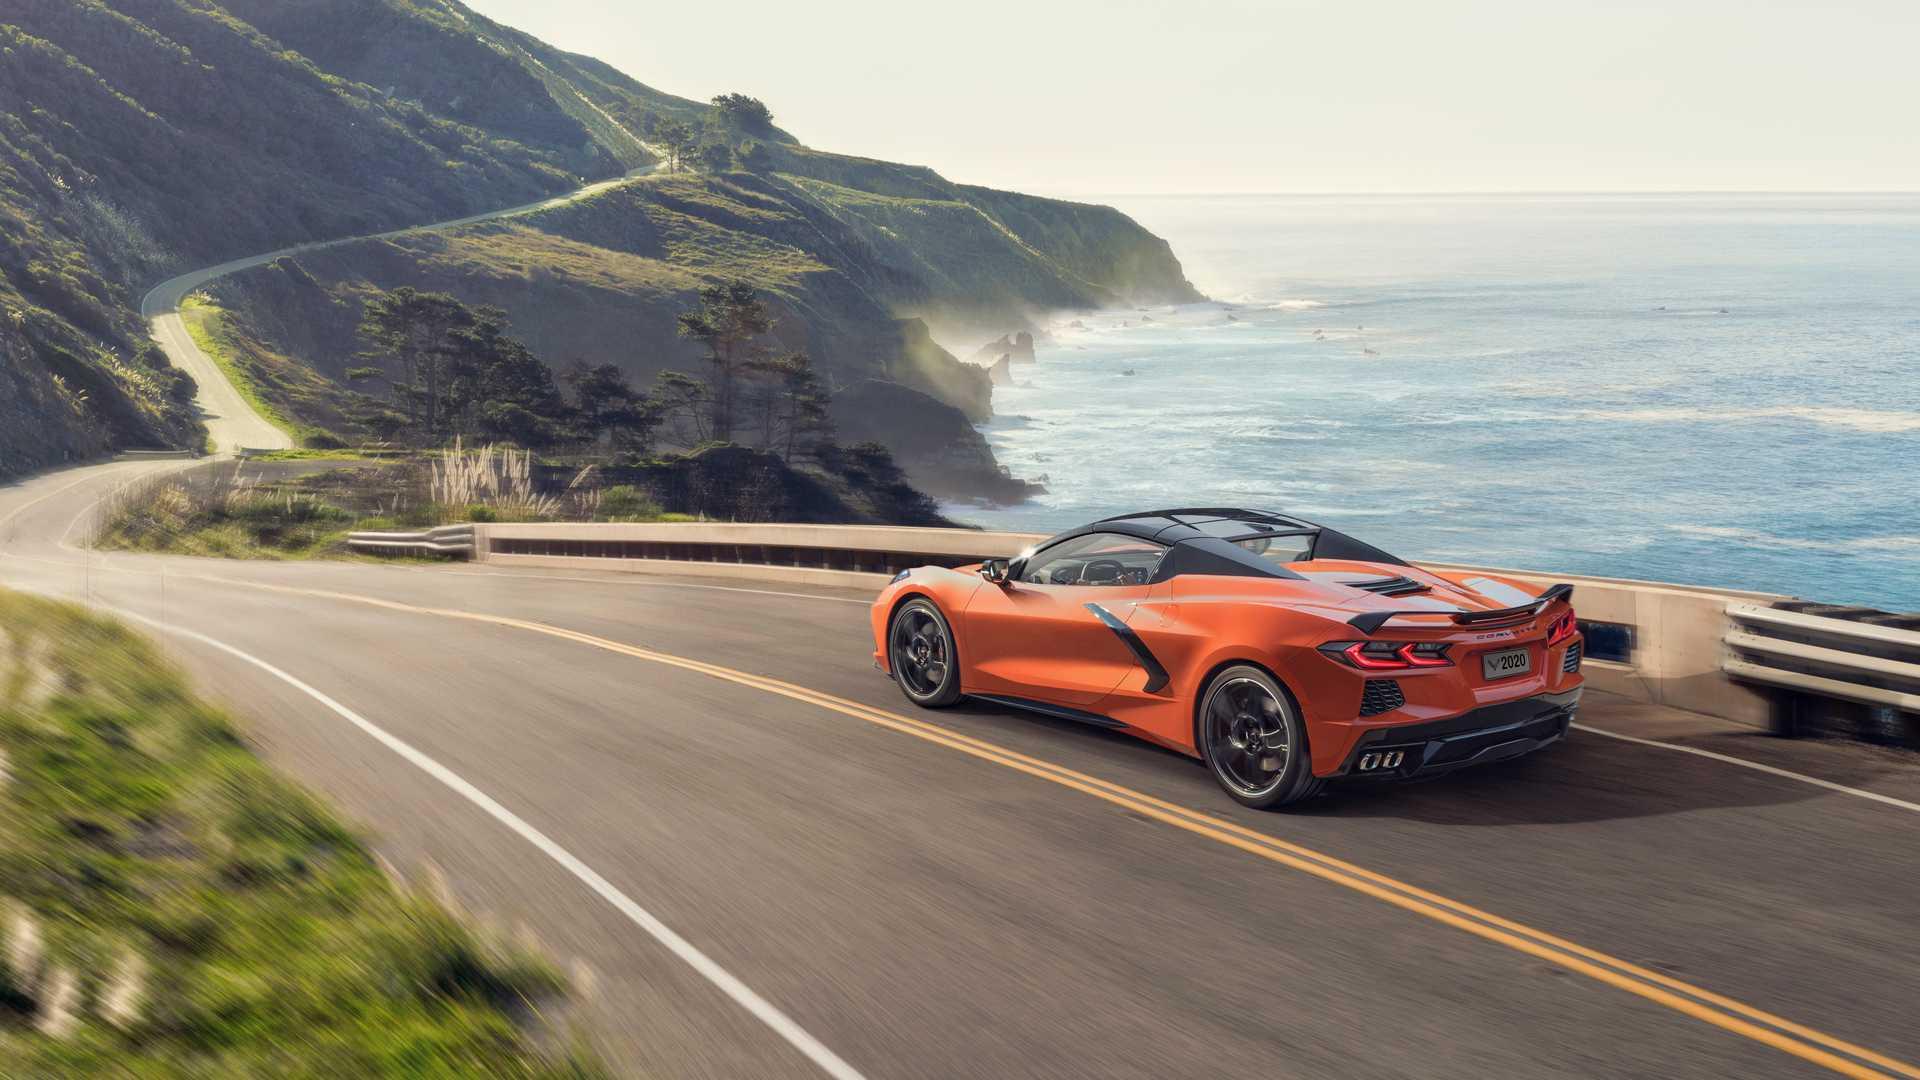 2020-chevrolet-corvette-convertible-3